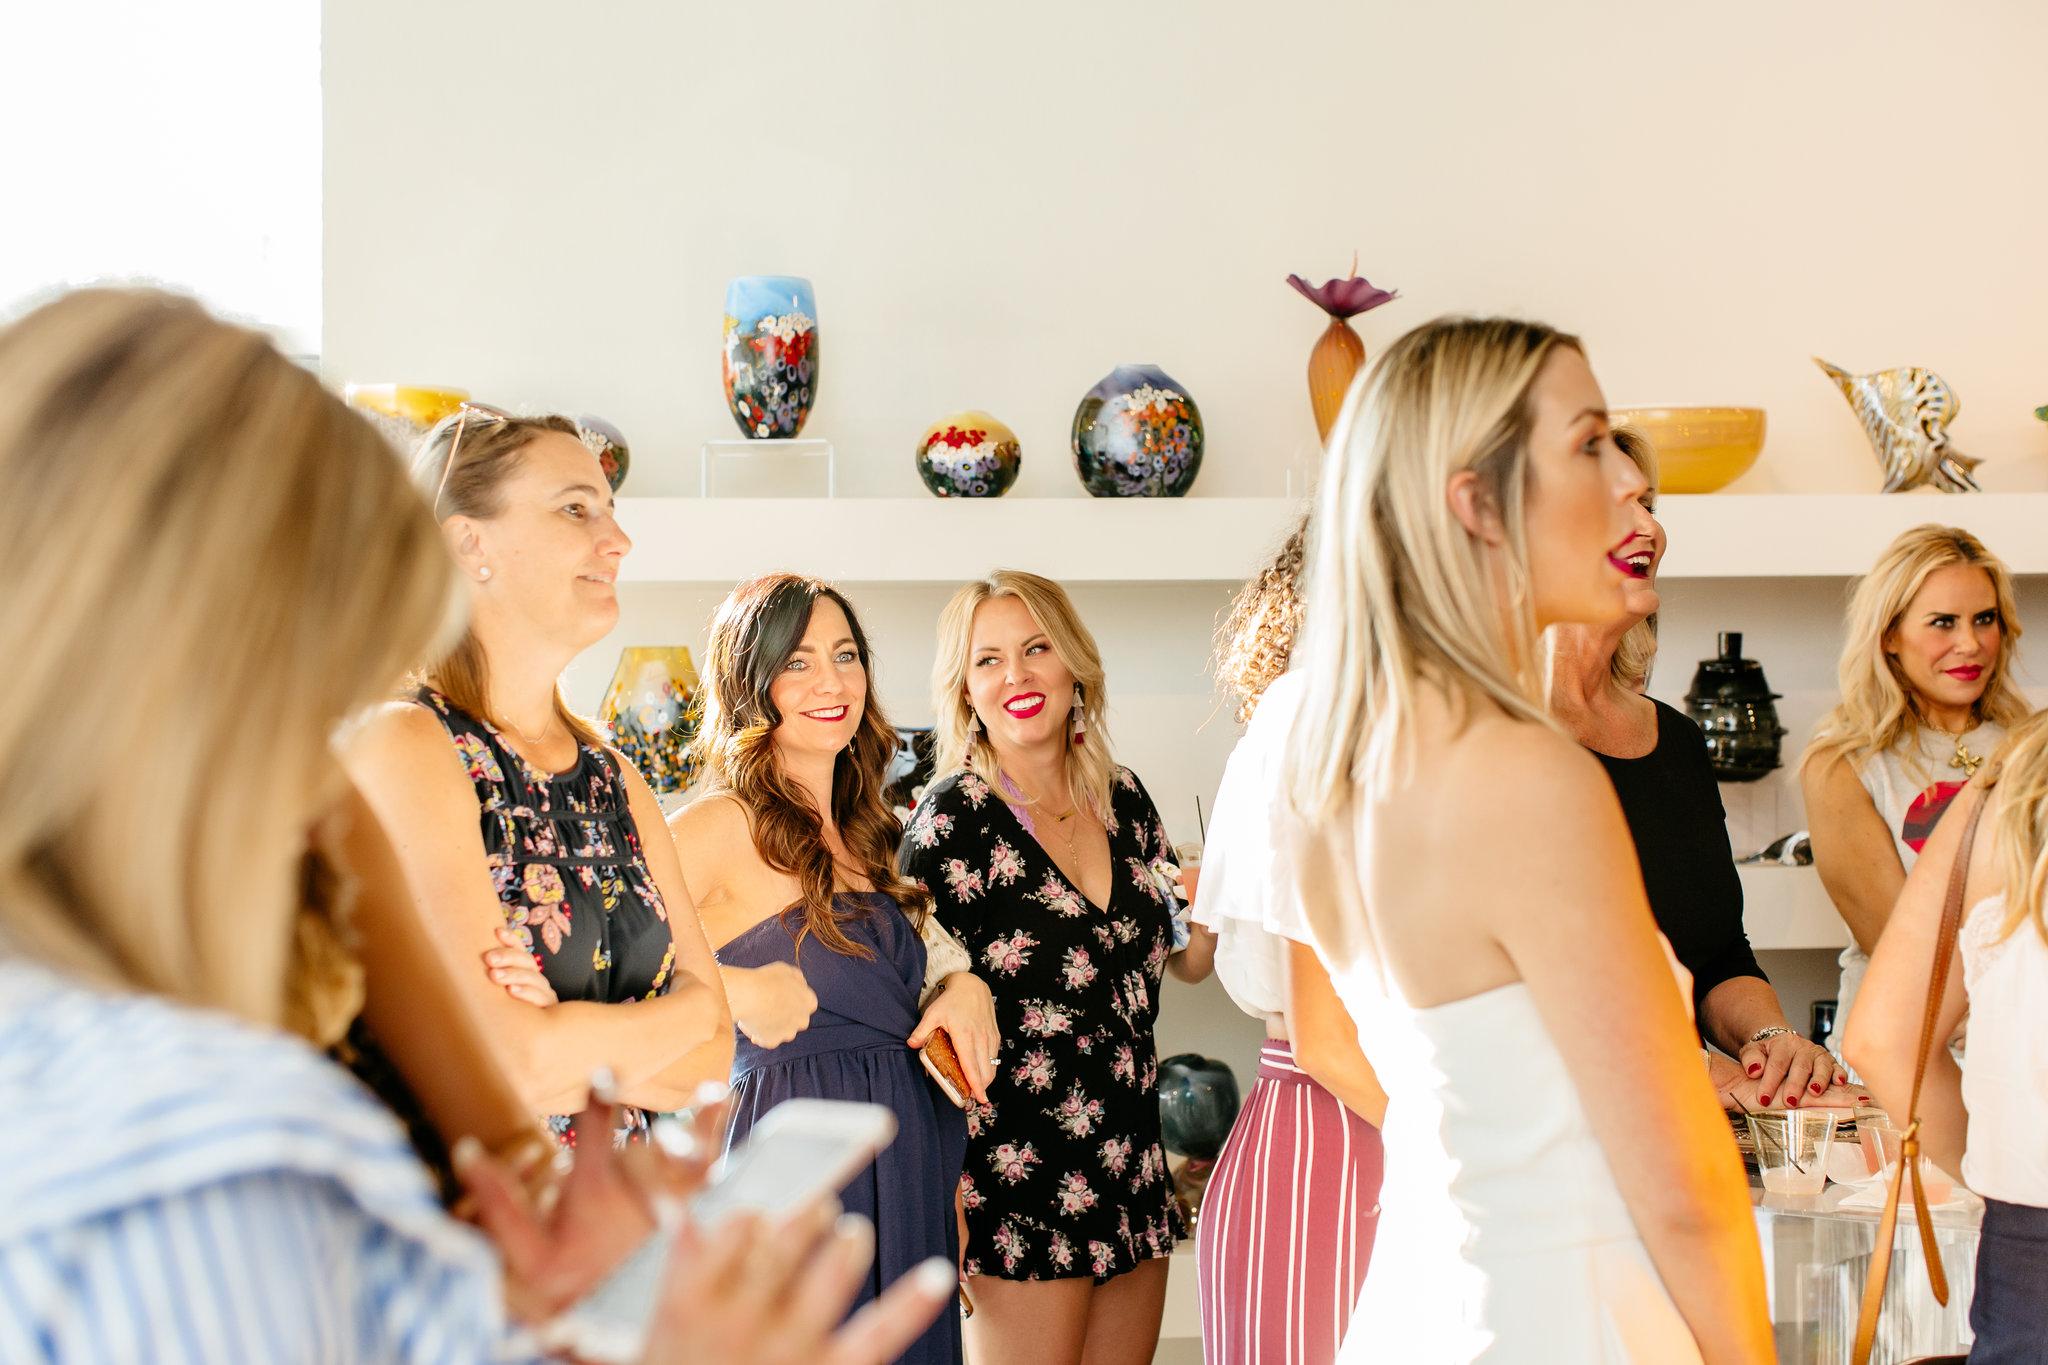 Alexa-Vossler-Photo_Dallas-Event-Photographer_Brite-Bar-Beauty-2018-Lipstick-Launch-Party-103.jpg